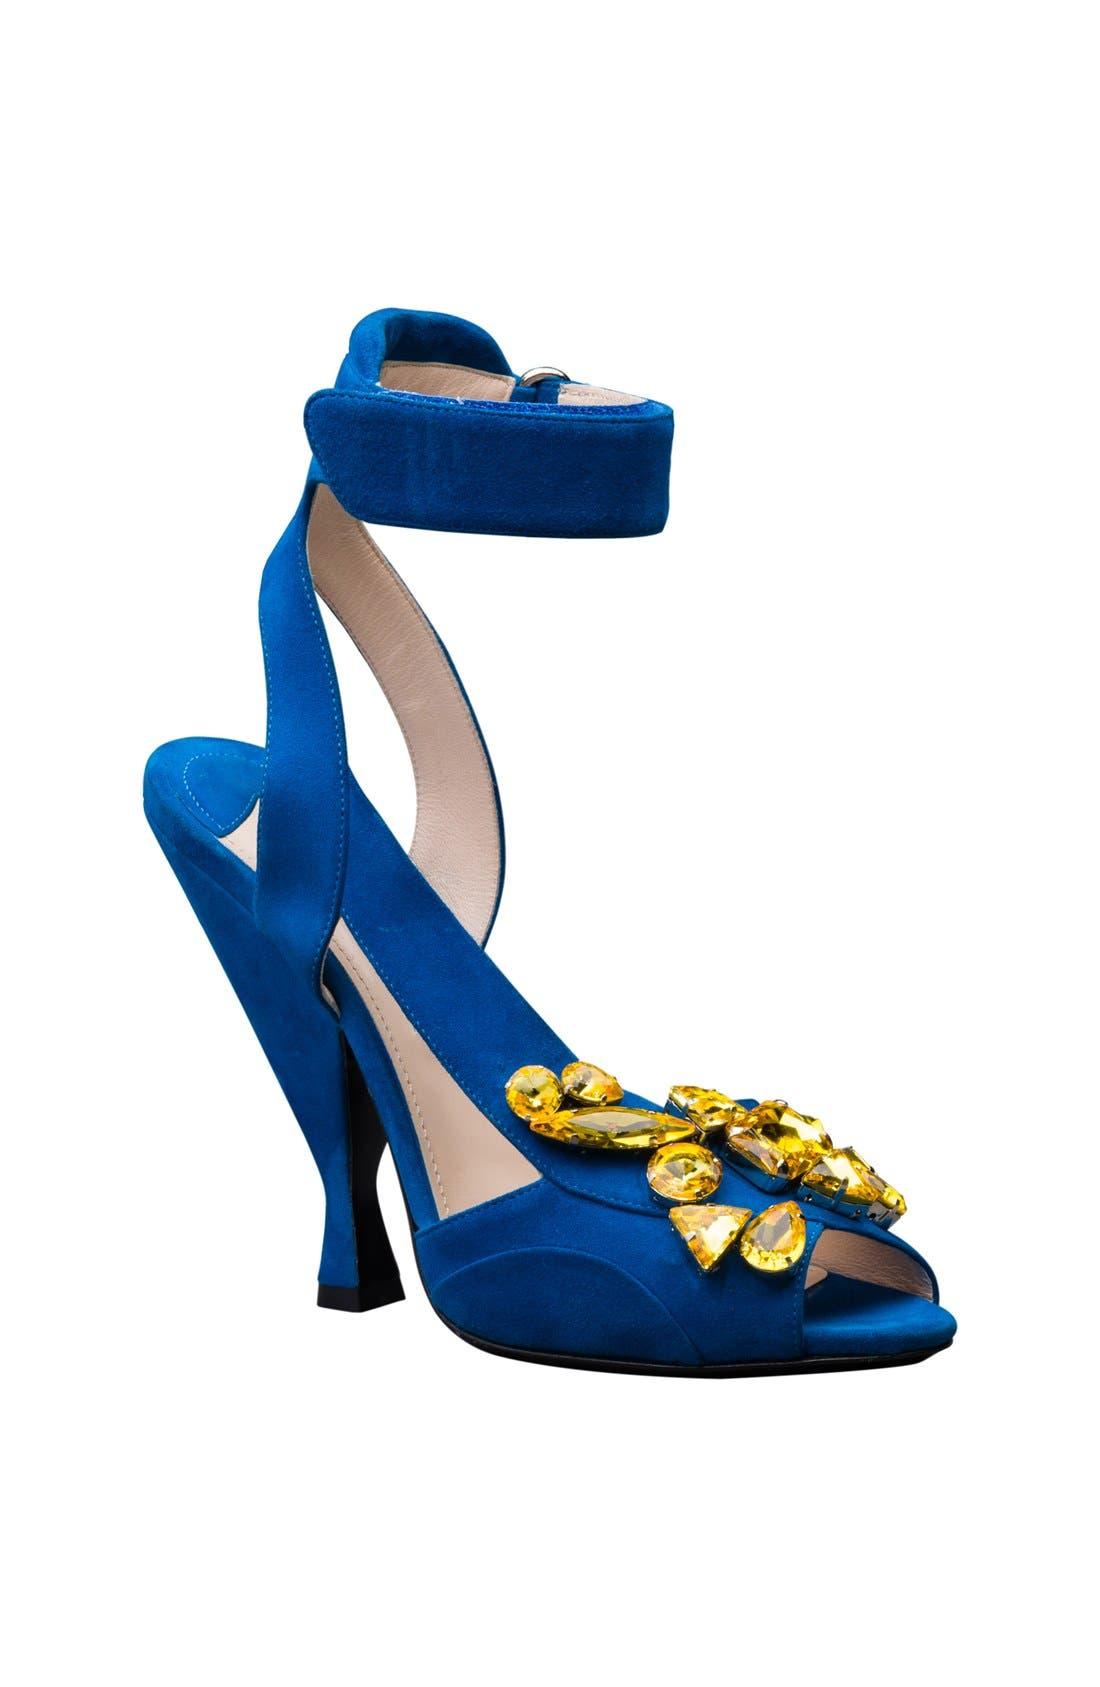 Alternate Image 1 Selected - Prada Jeweled Ankle Strap Sandal